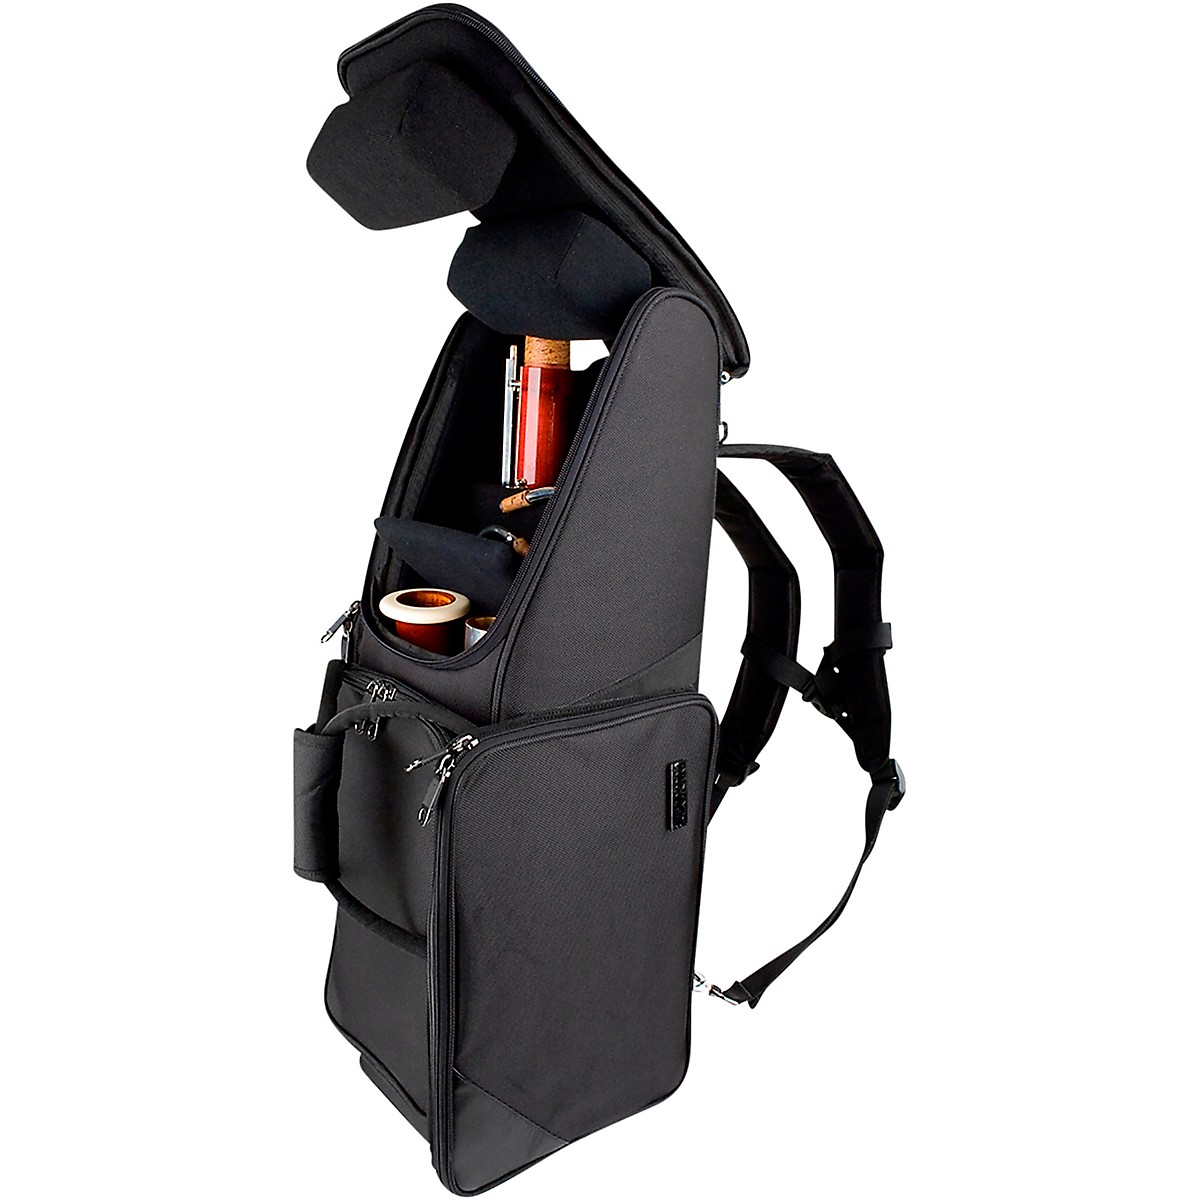 Protec Platinum Series Bassoon Bag